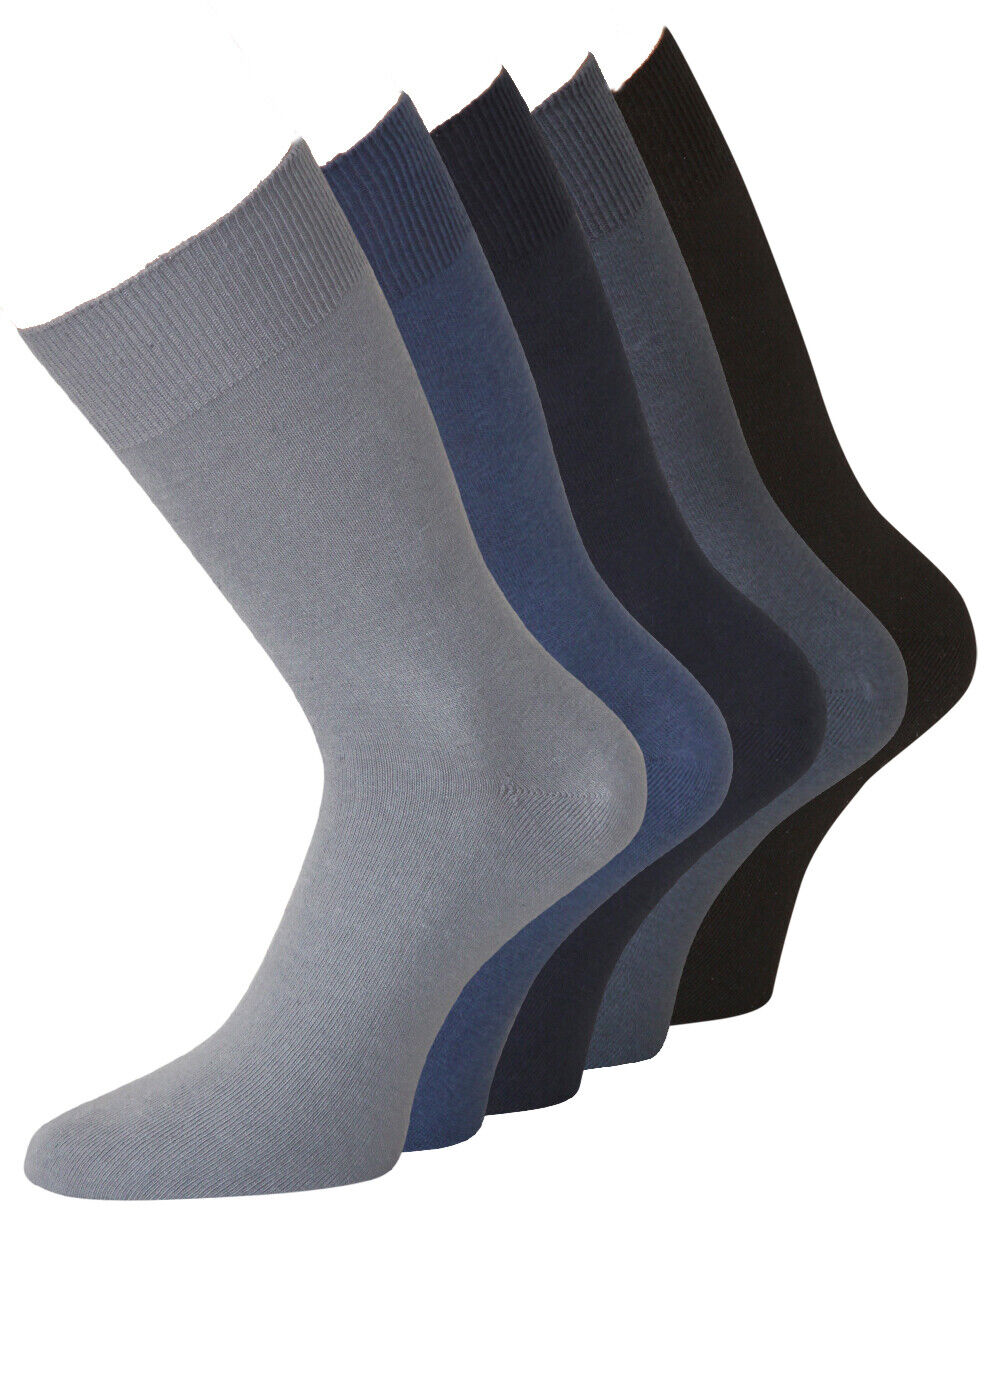 Herren Socken Baumwoll Socken Anzug Socken Strümpfe KB Socken® 5 oder 10 Paar